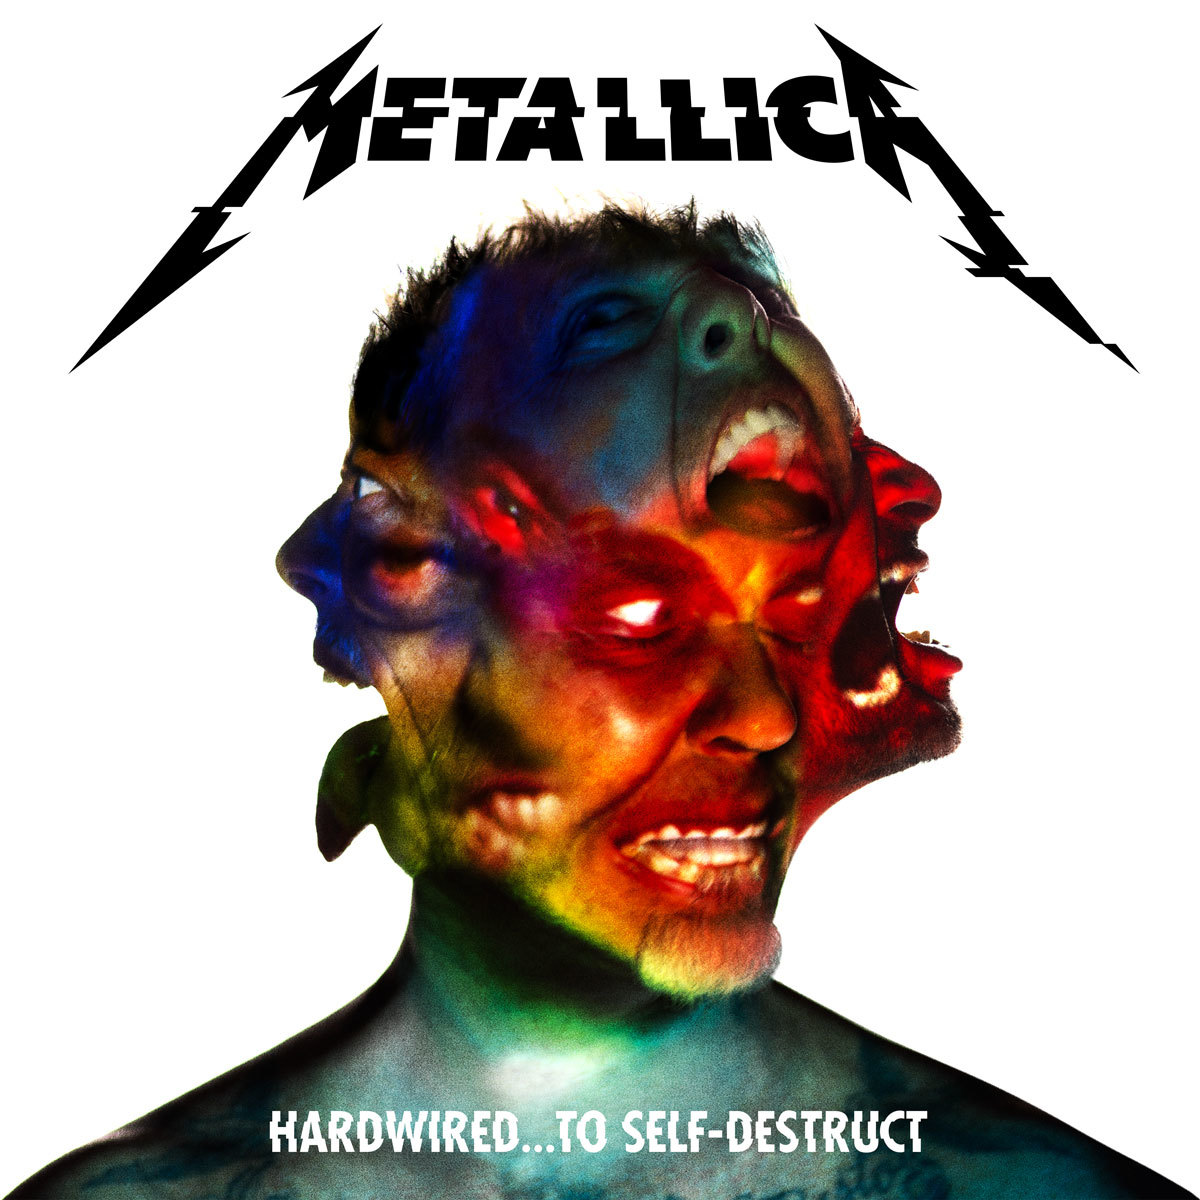 metallica_hardwired_to_self-destruct_2016.jpeg